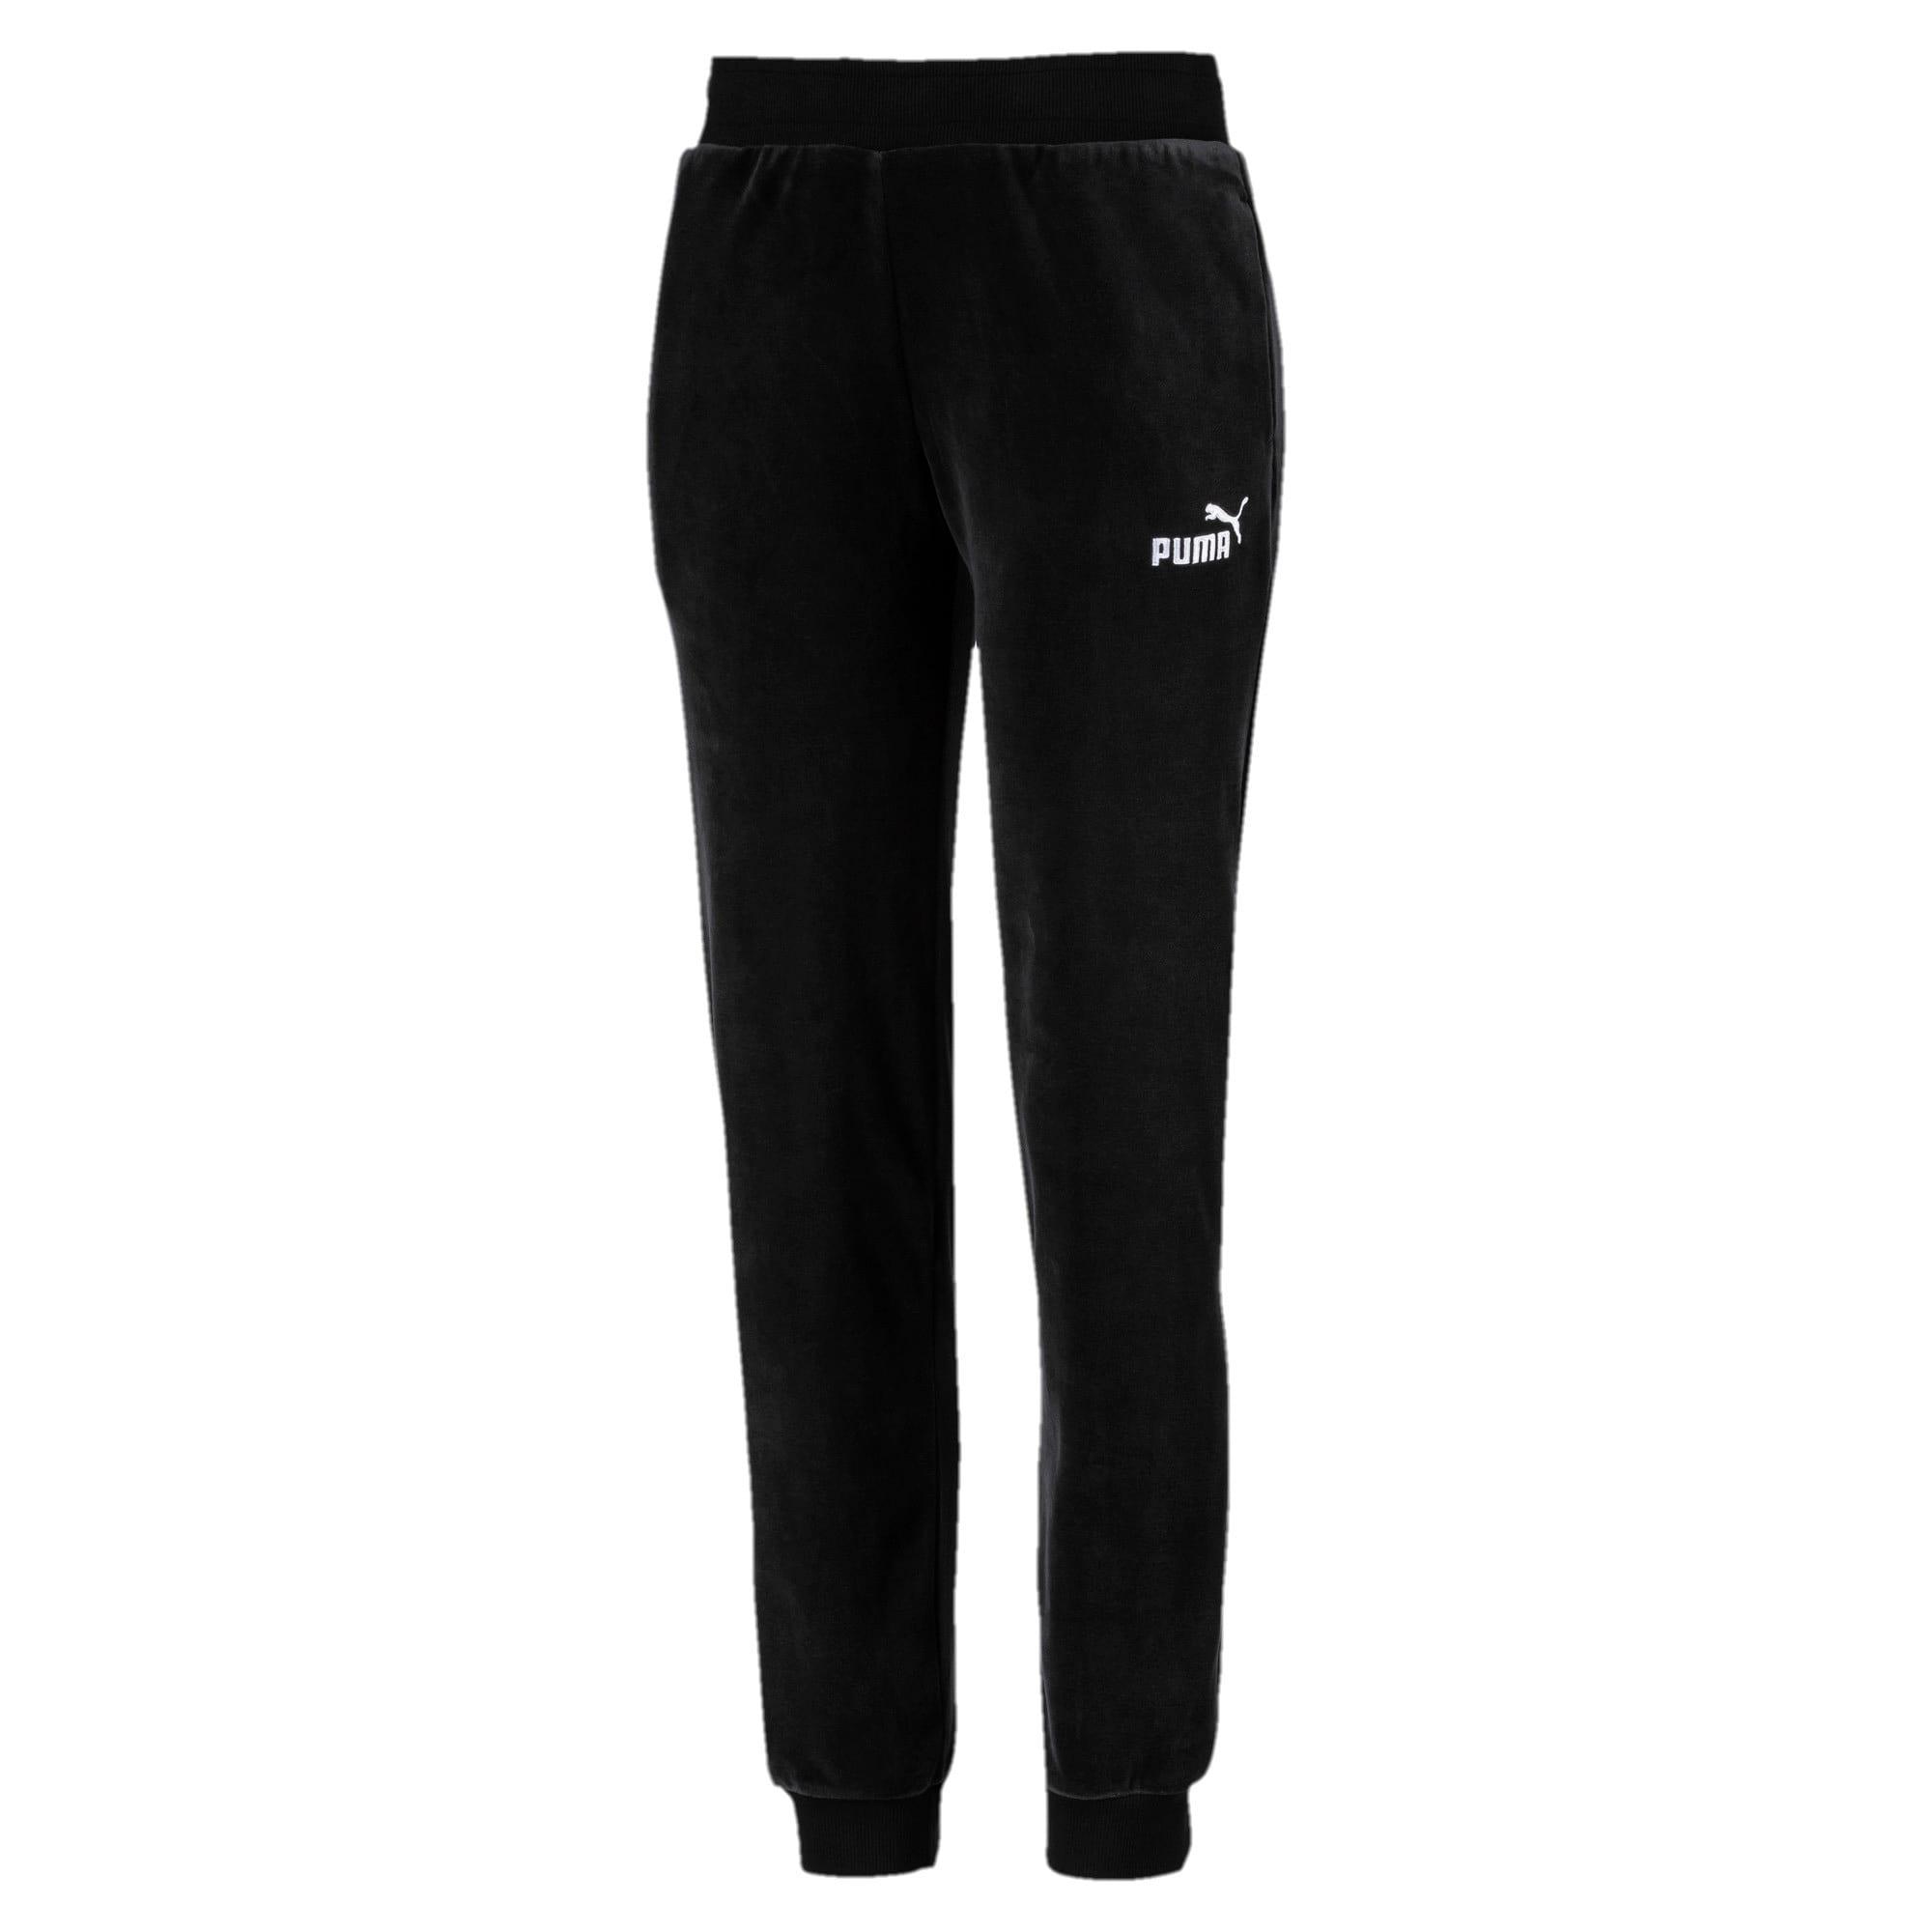 Thumbnail 1 of Essentials Velour Women's Sweatpants, Cotton Black, medium